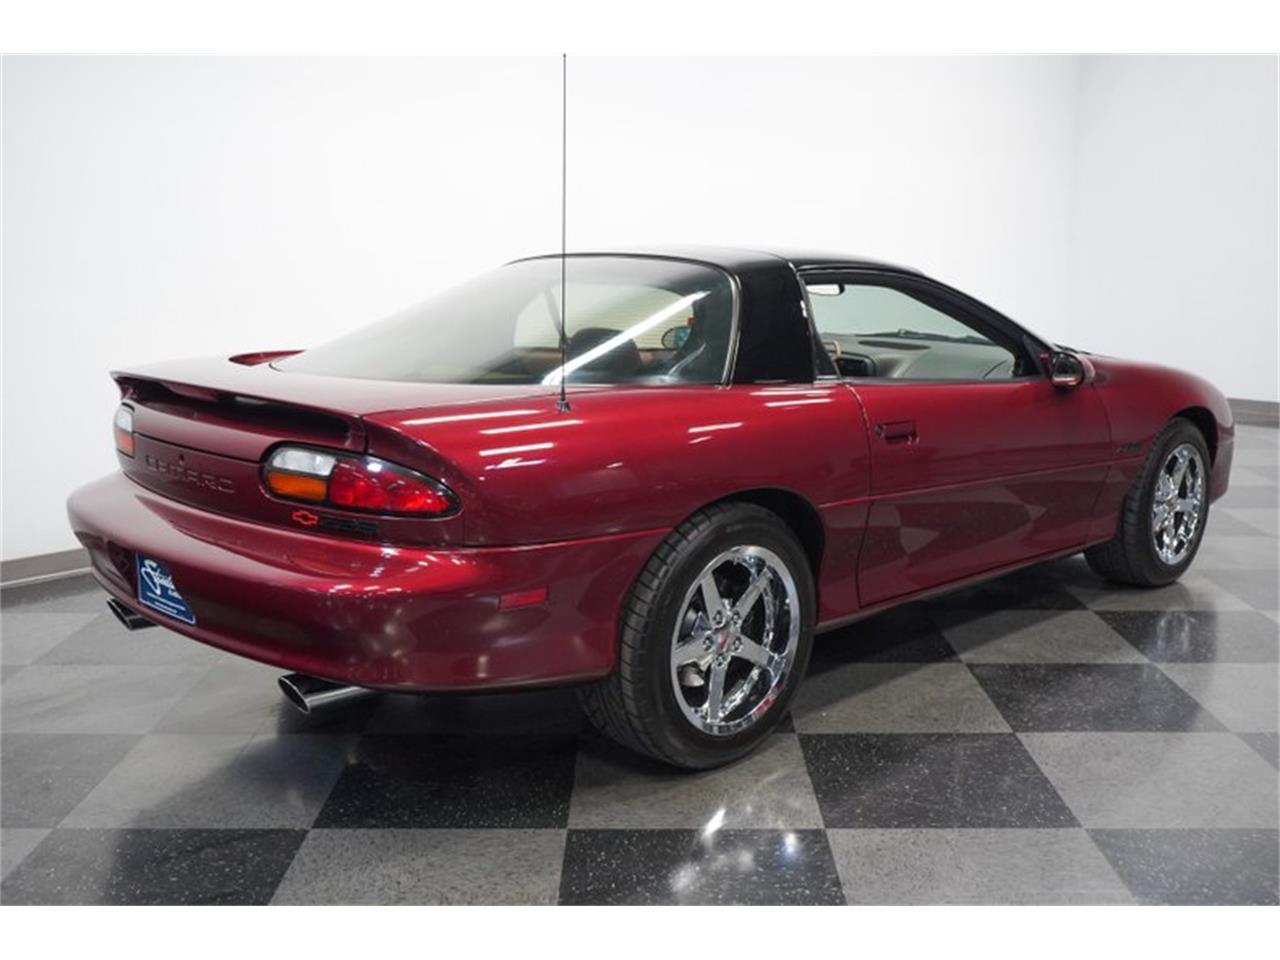 2002 Chevrolet Camaro (CC-1410086) for sale in Mesa, Arizona